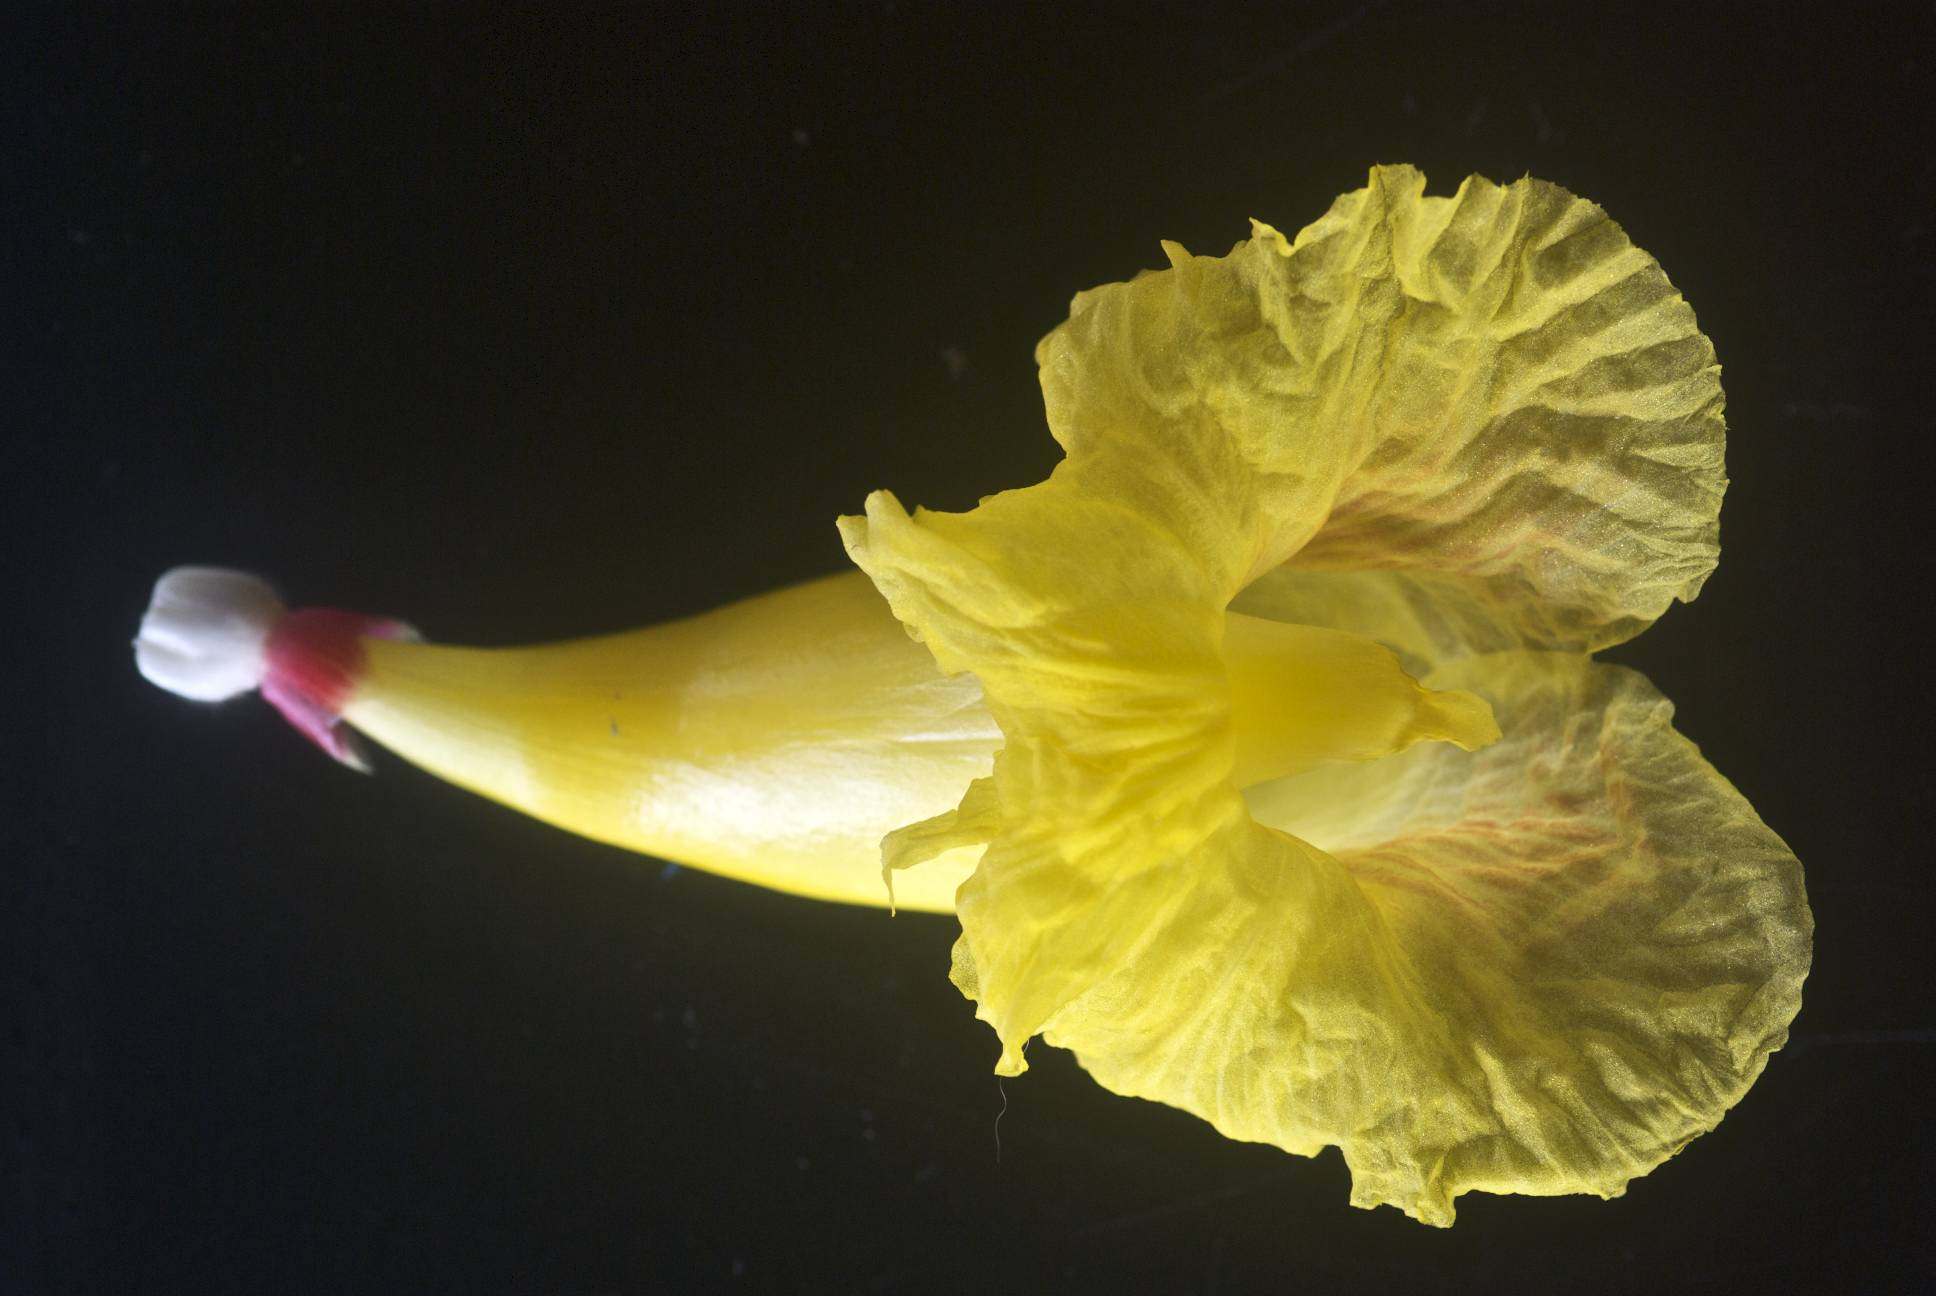 Photo# 15676 - Costus 'Mellow Yellow' - photos by John Mood